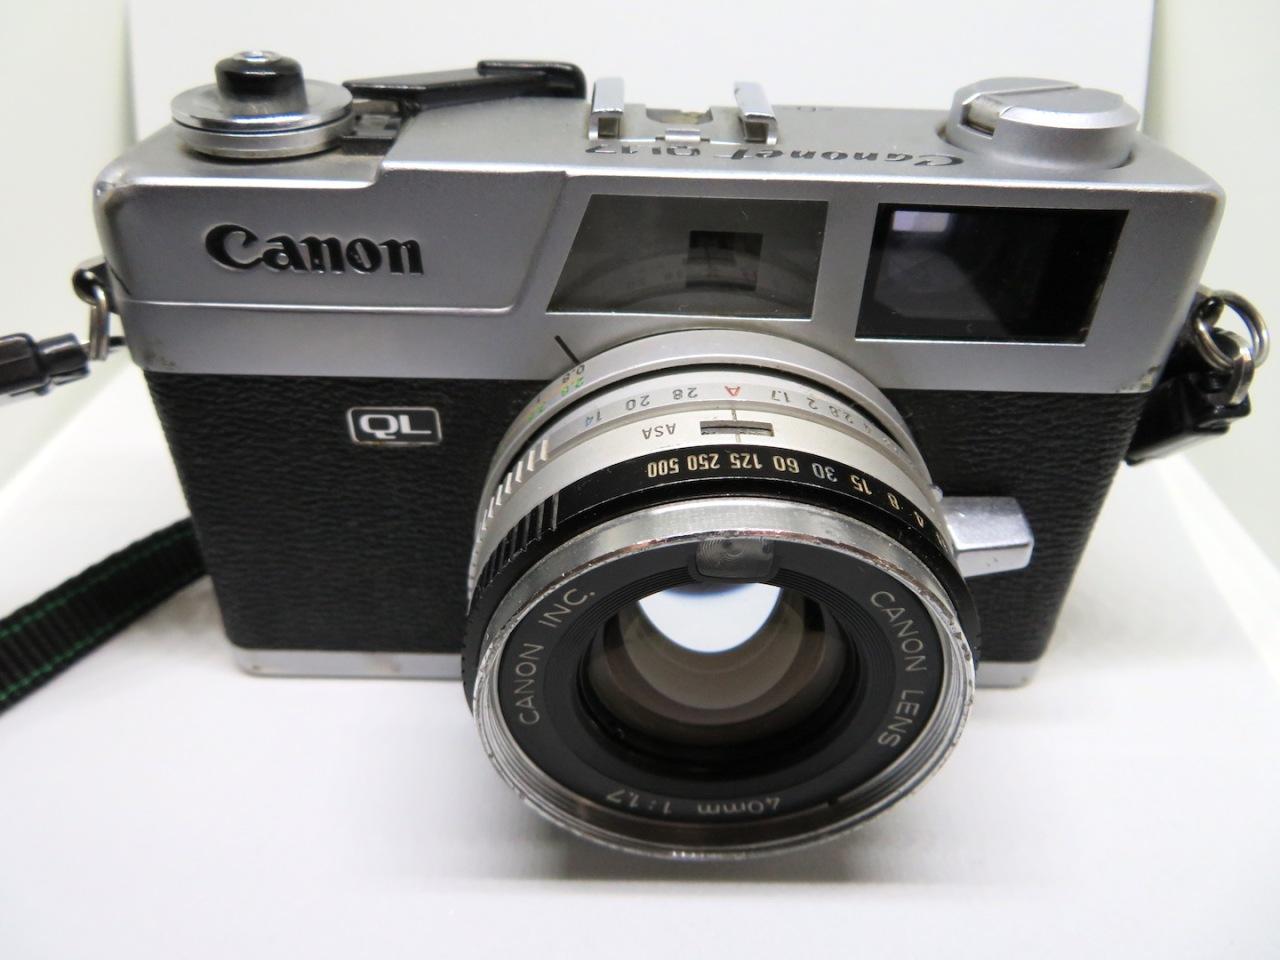 Canonet Q17